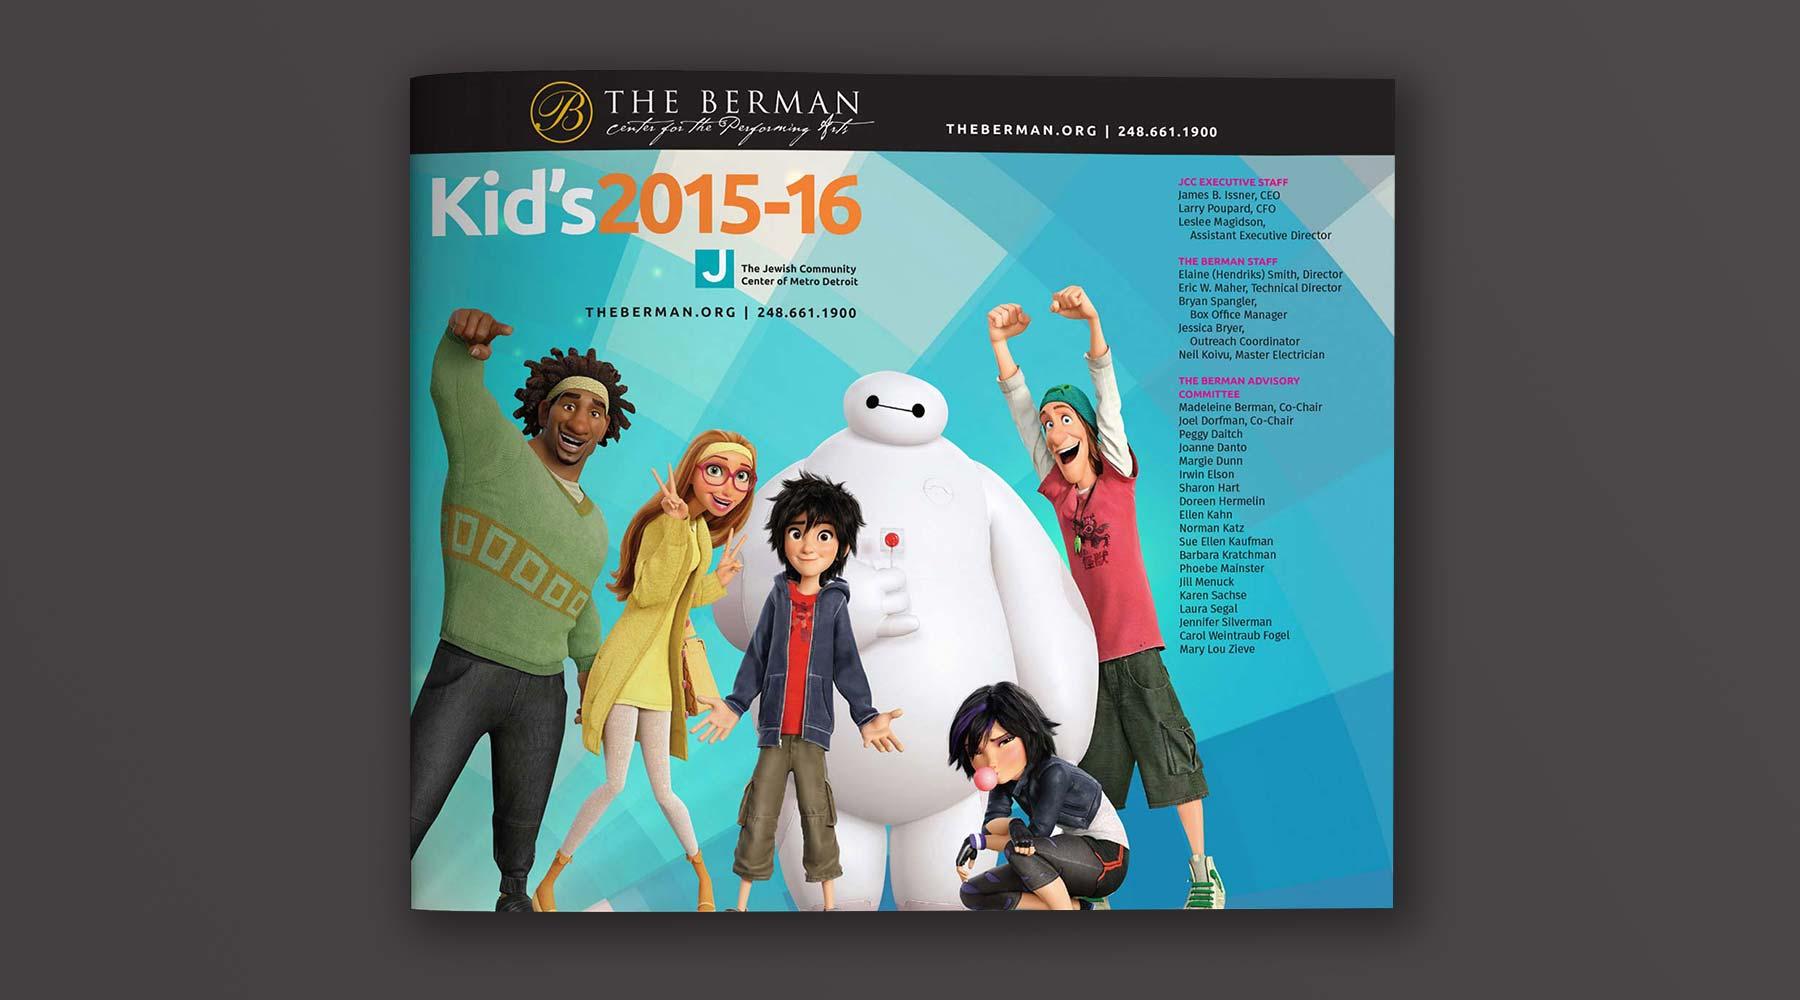 The Berman Theater 2017-18 Kids Season Brochure Cover